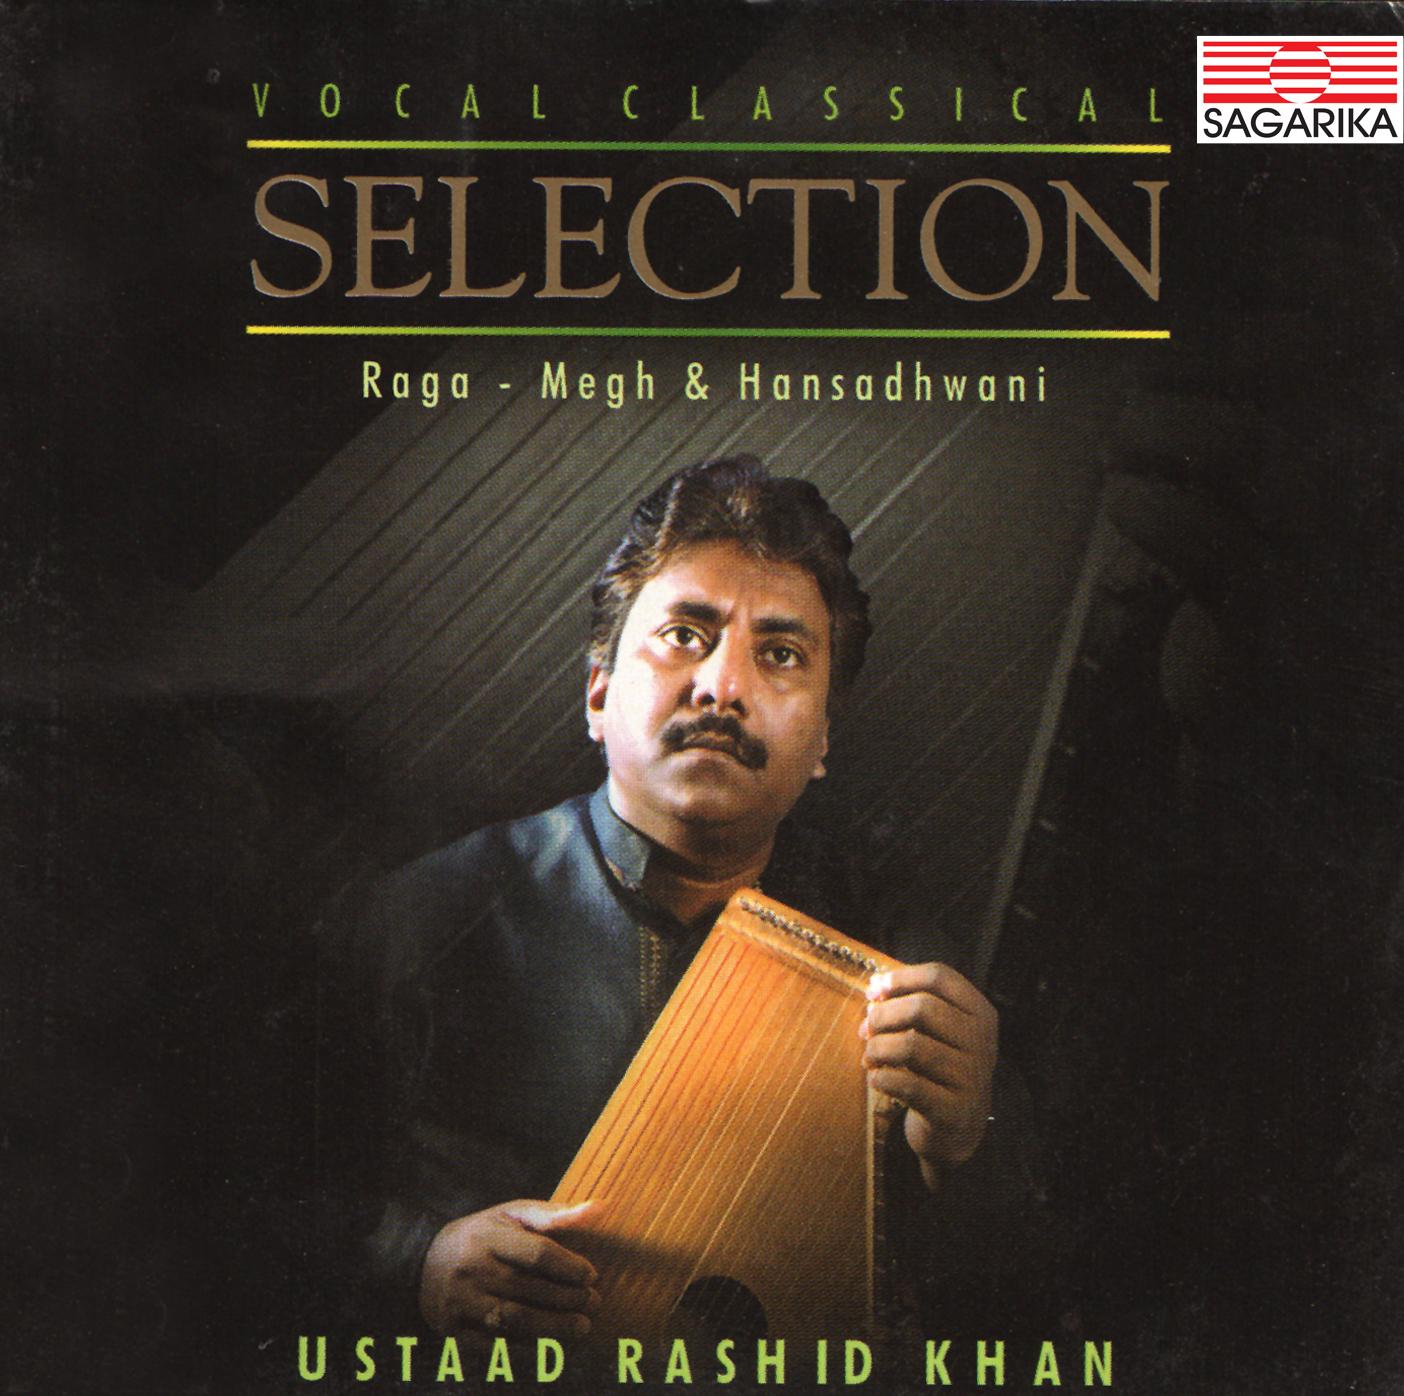 Selection – Raga Megh